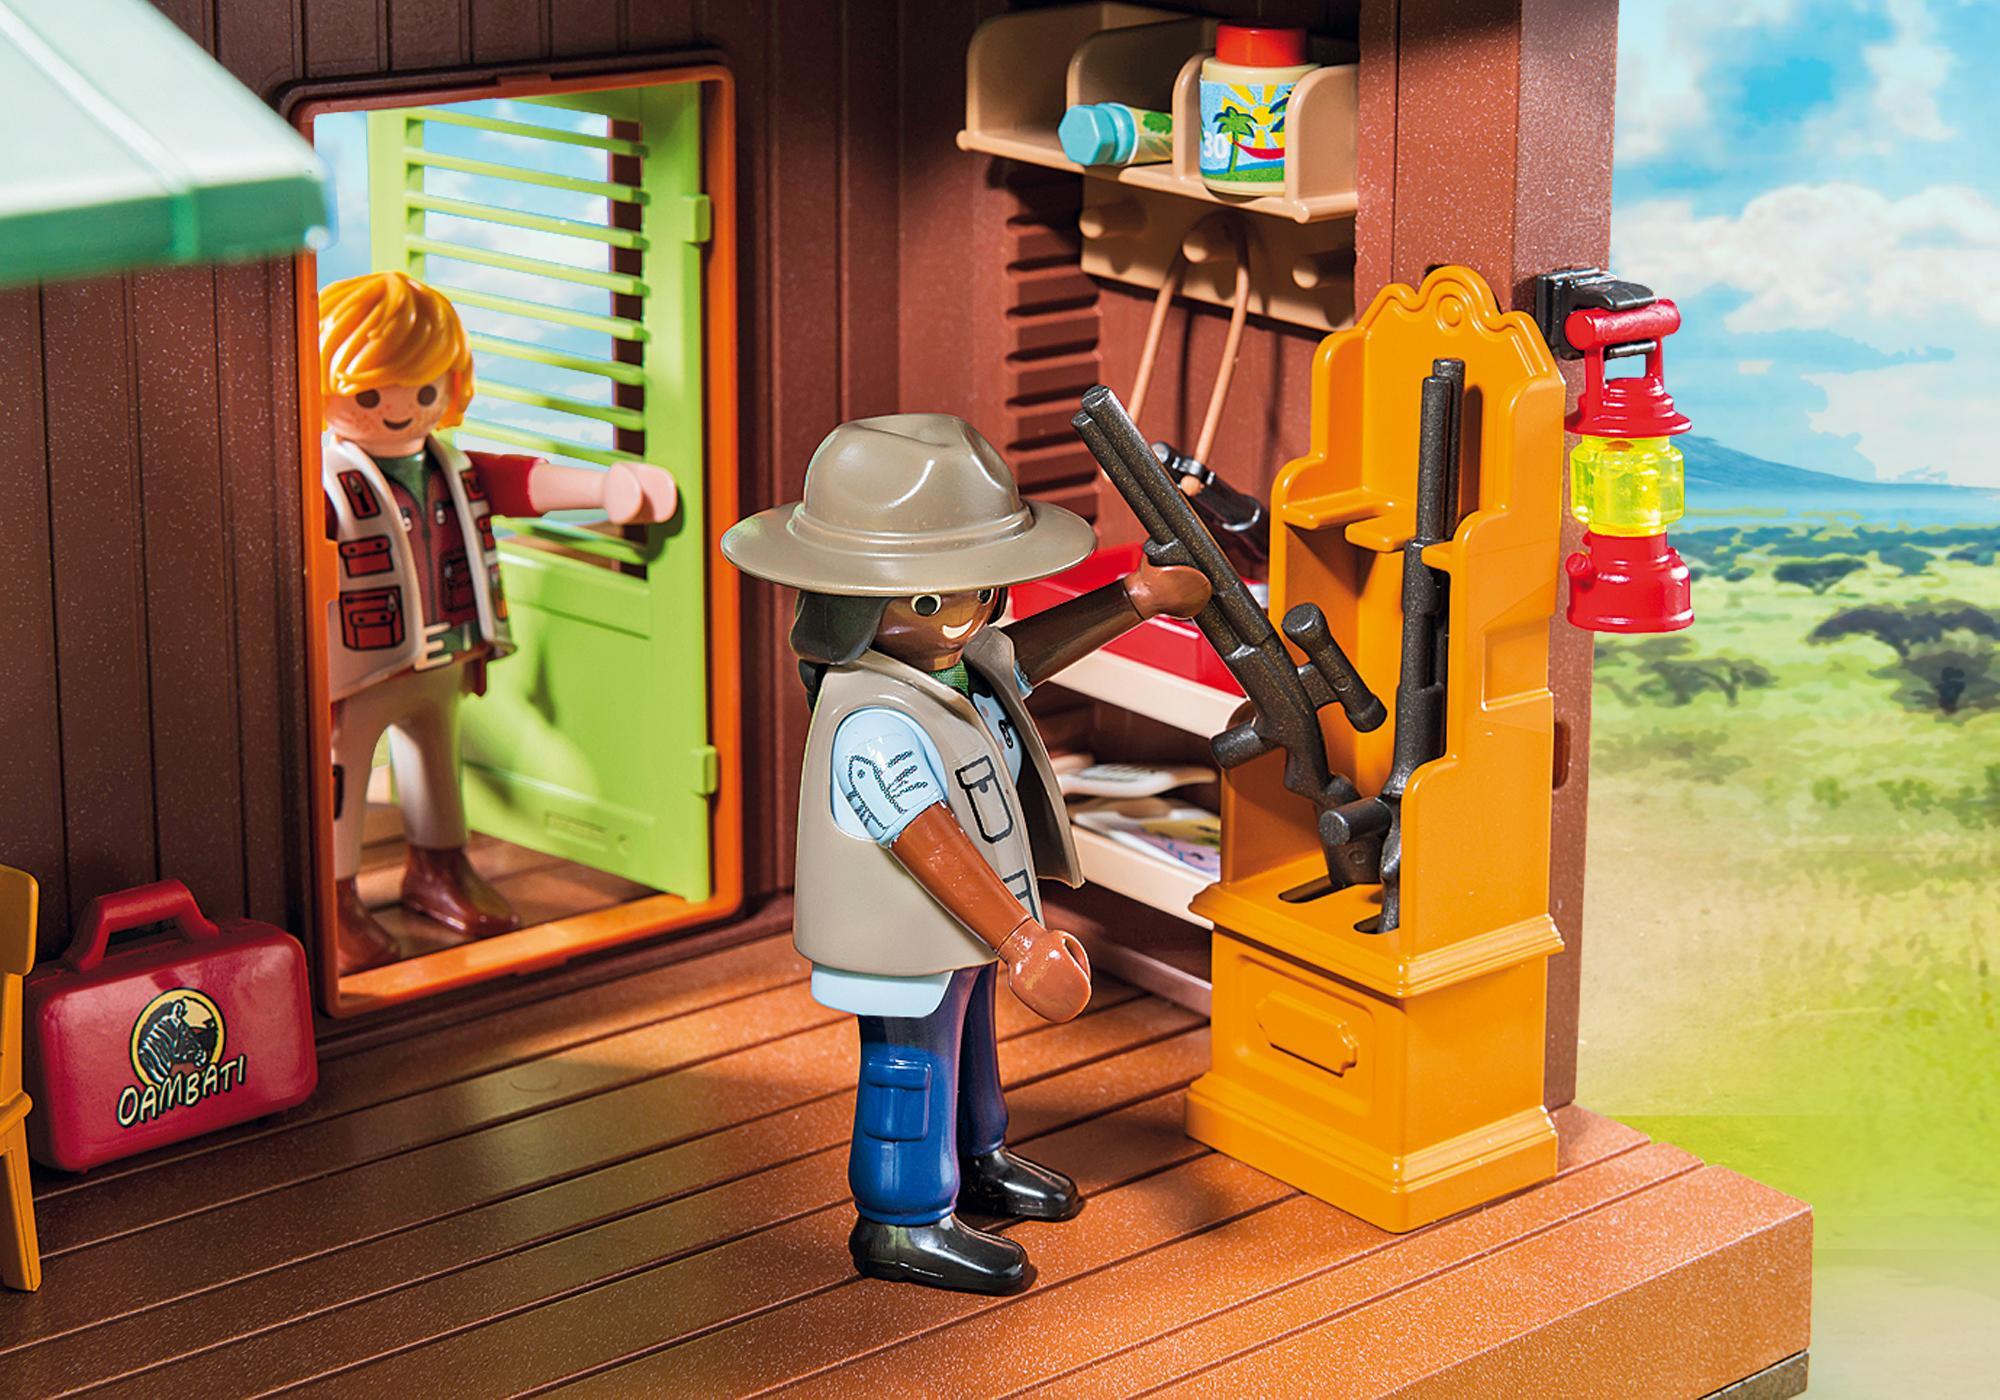 http://media.playmobil.com/i/playmobil/6936_product_extra1/Σταθμός περίθαλψης άγριων ζώων